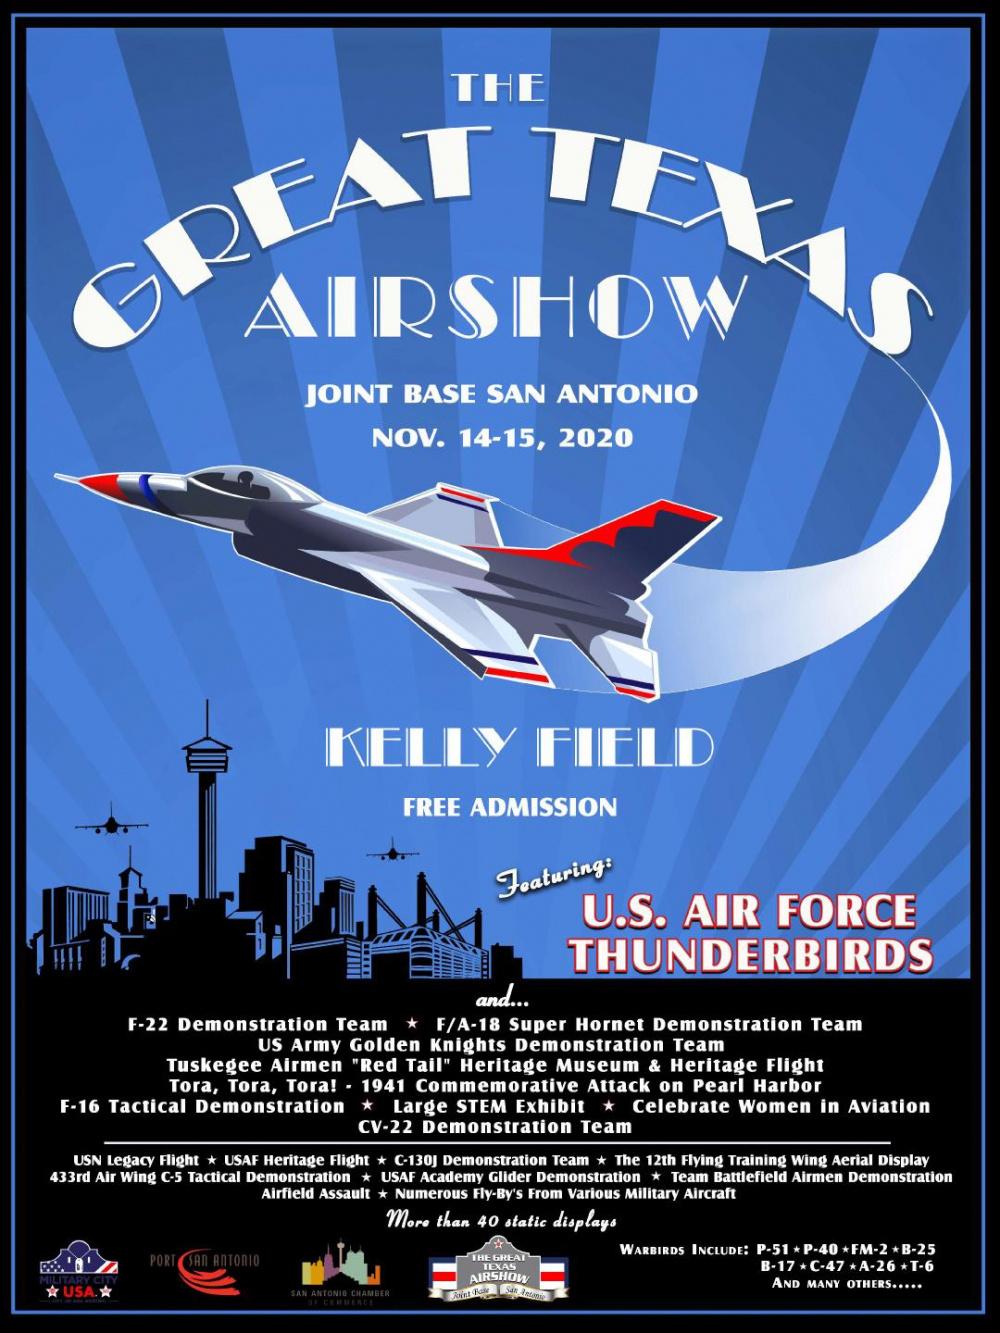 JBSA Great Texas Airshow Poster